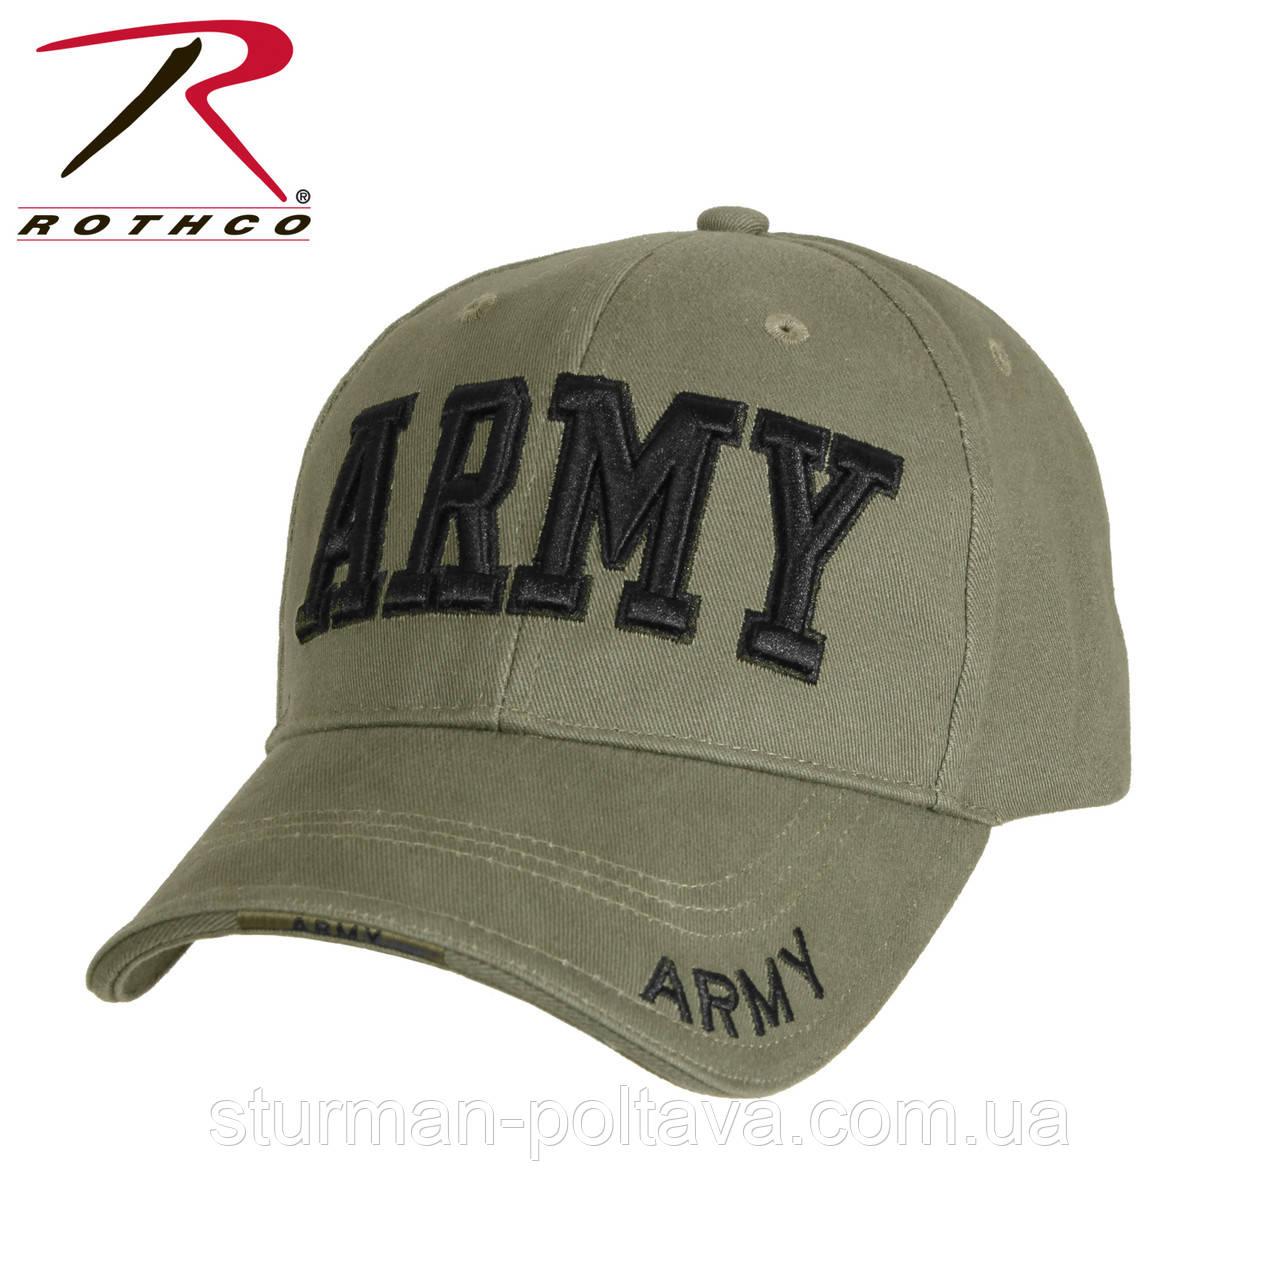 "Бейсболка  c вышивкой  ""ARMY""   олива Rotcho USA"